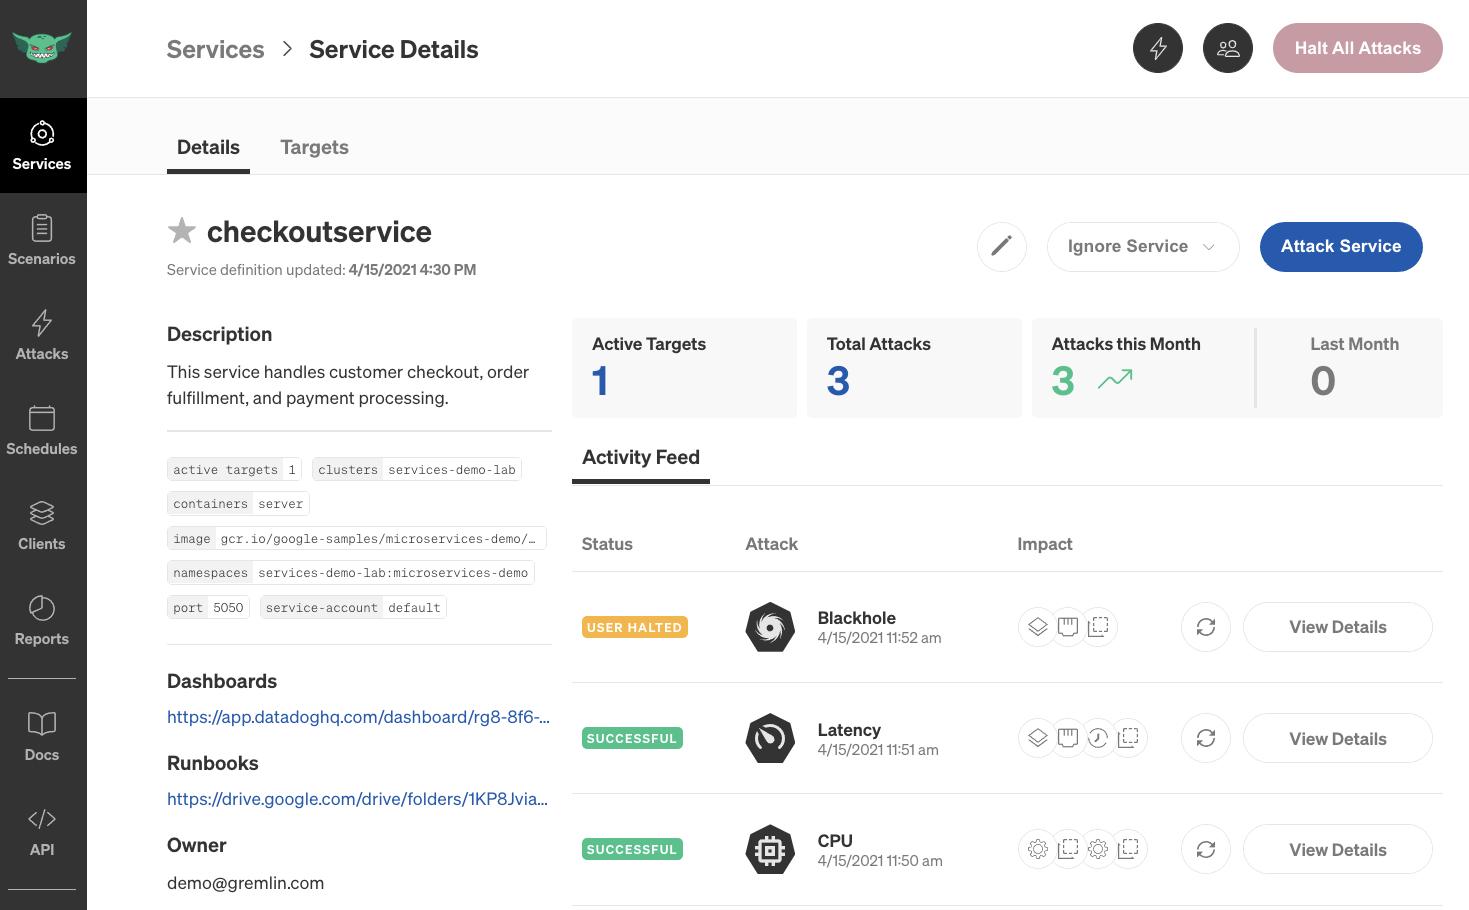 Gremlin service details interface